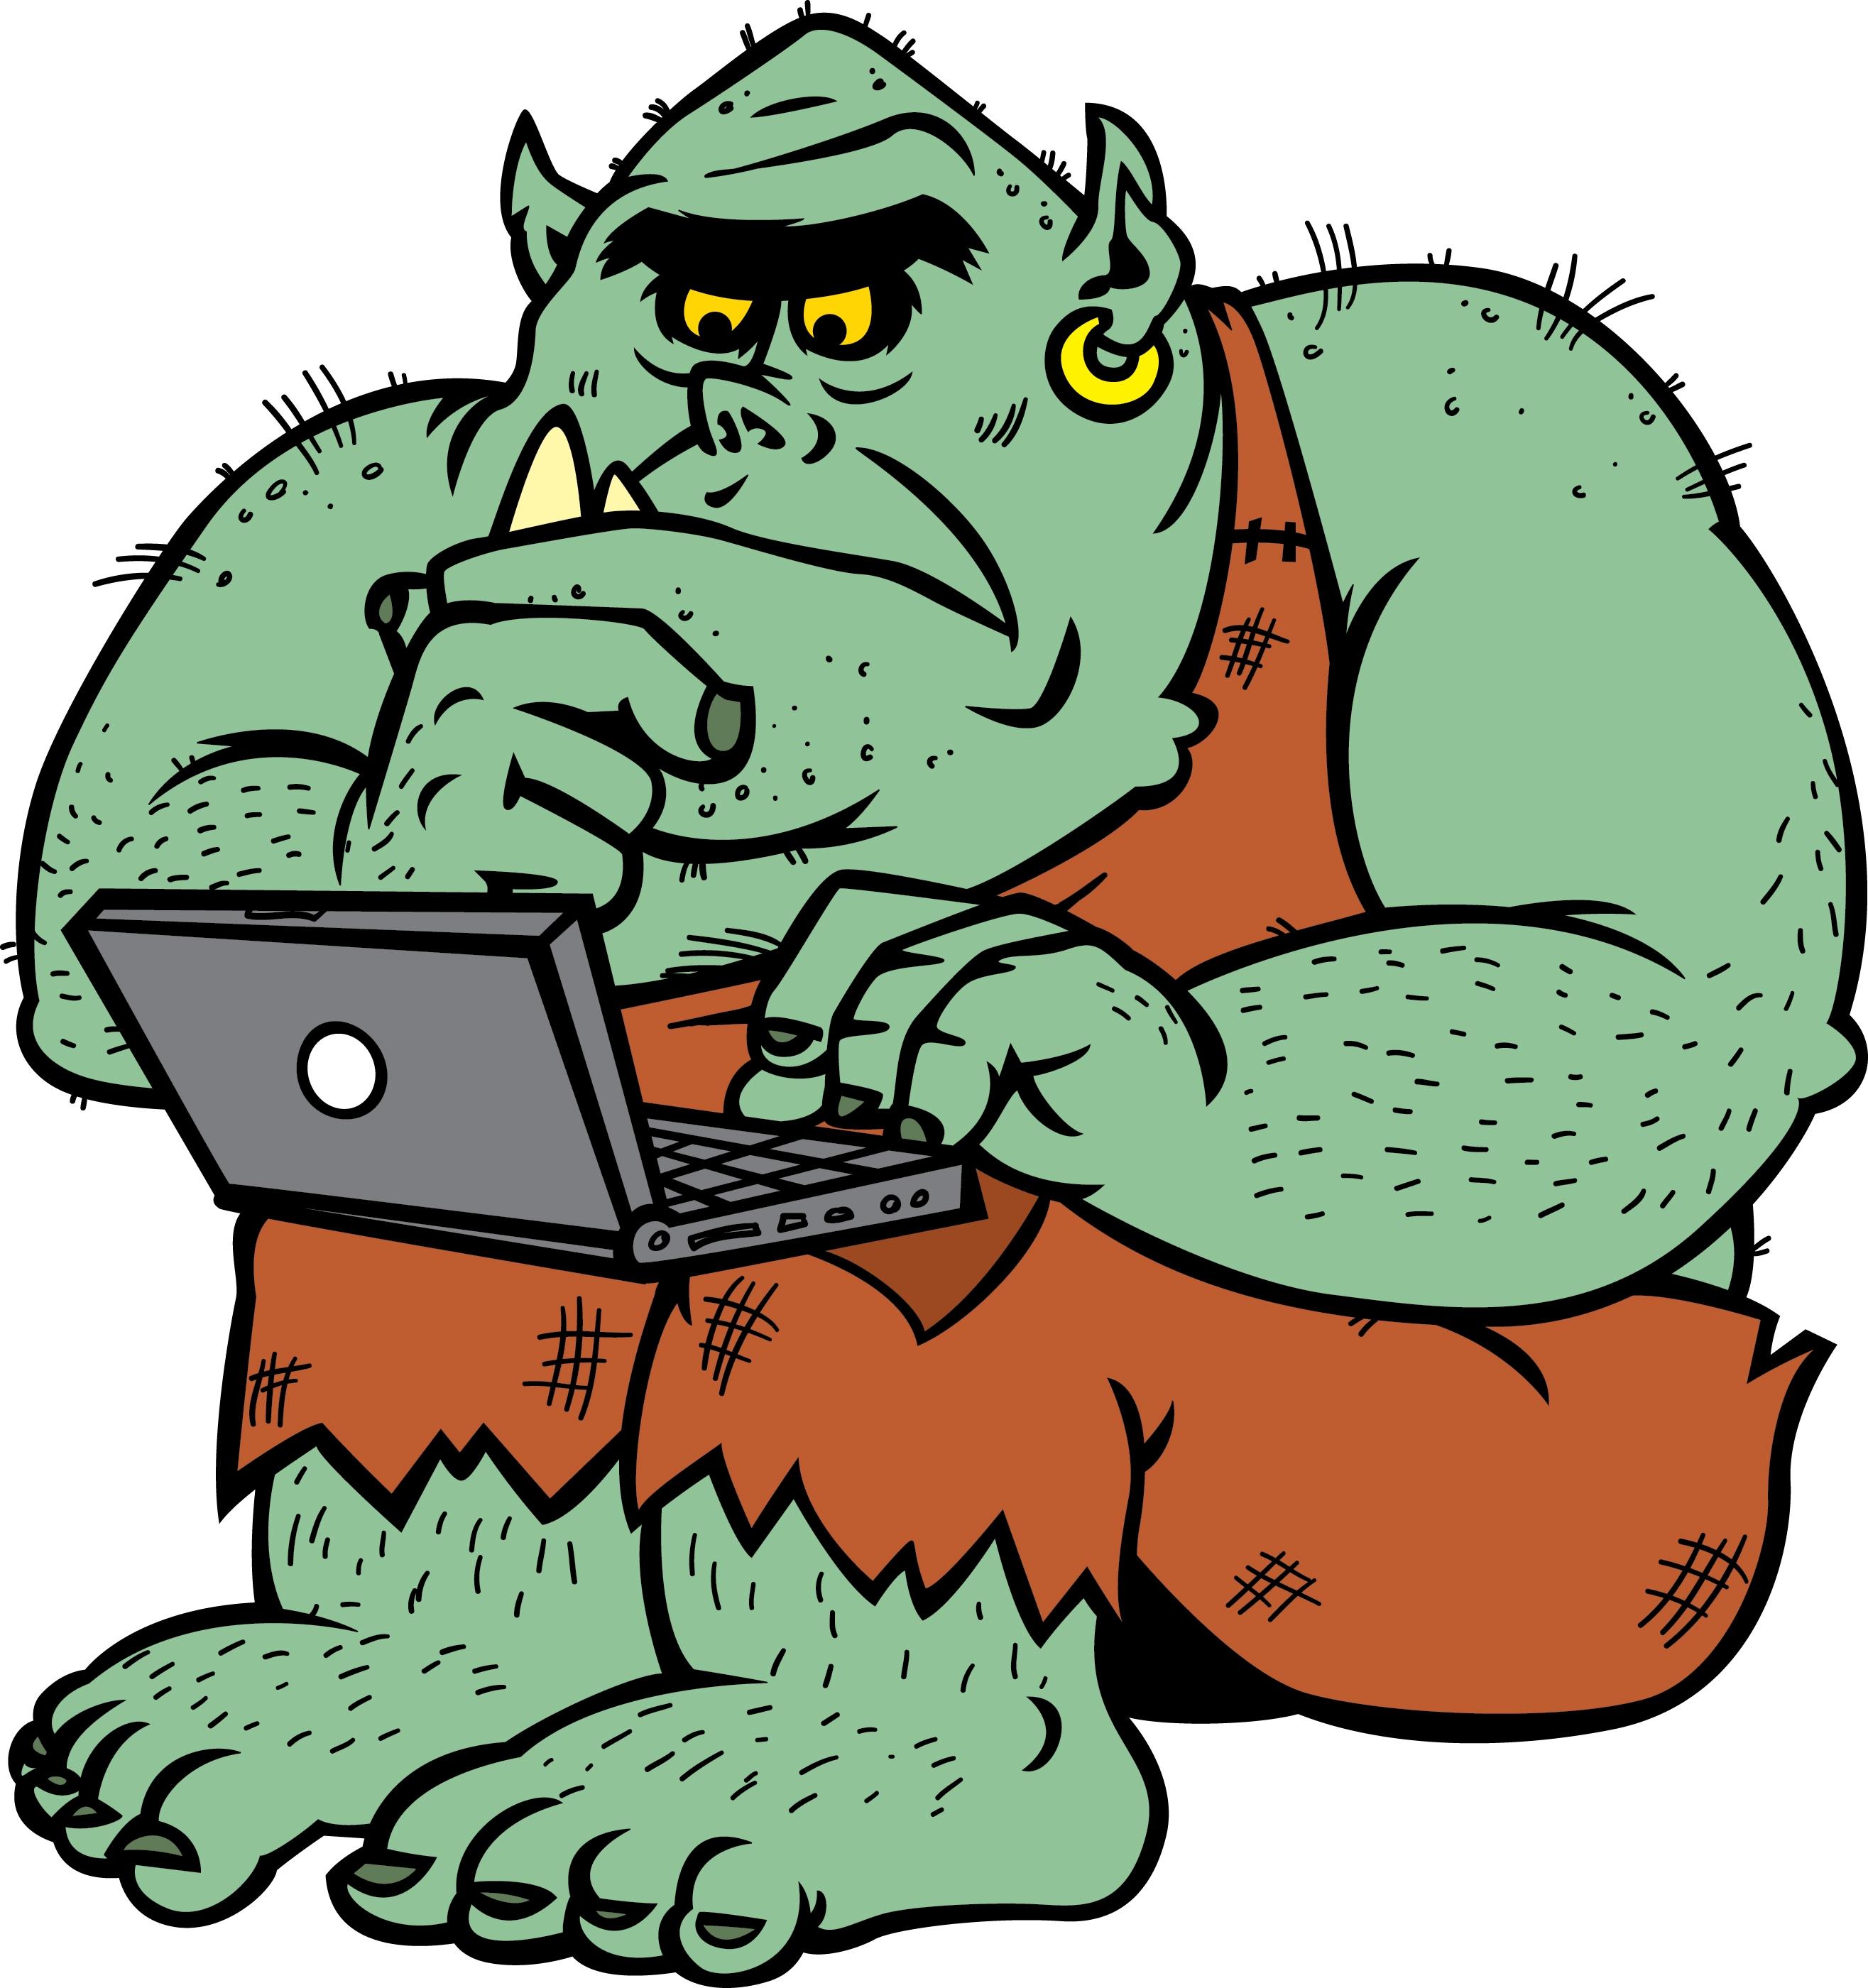 http://www.snut.fr/wp-content/uploads/2015/06/image-de-troll-7.jpg